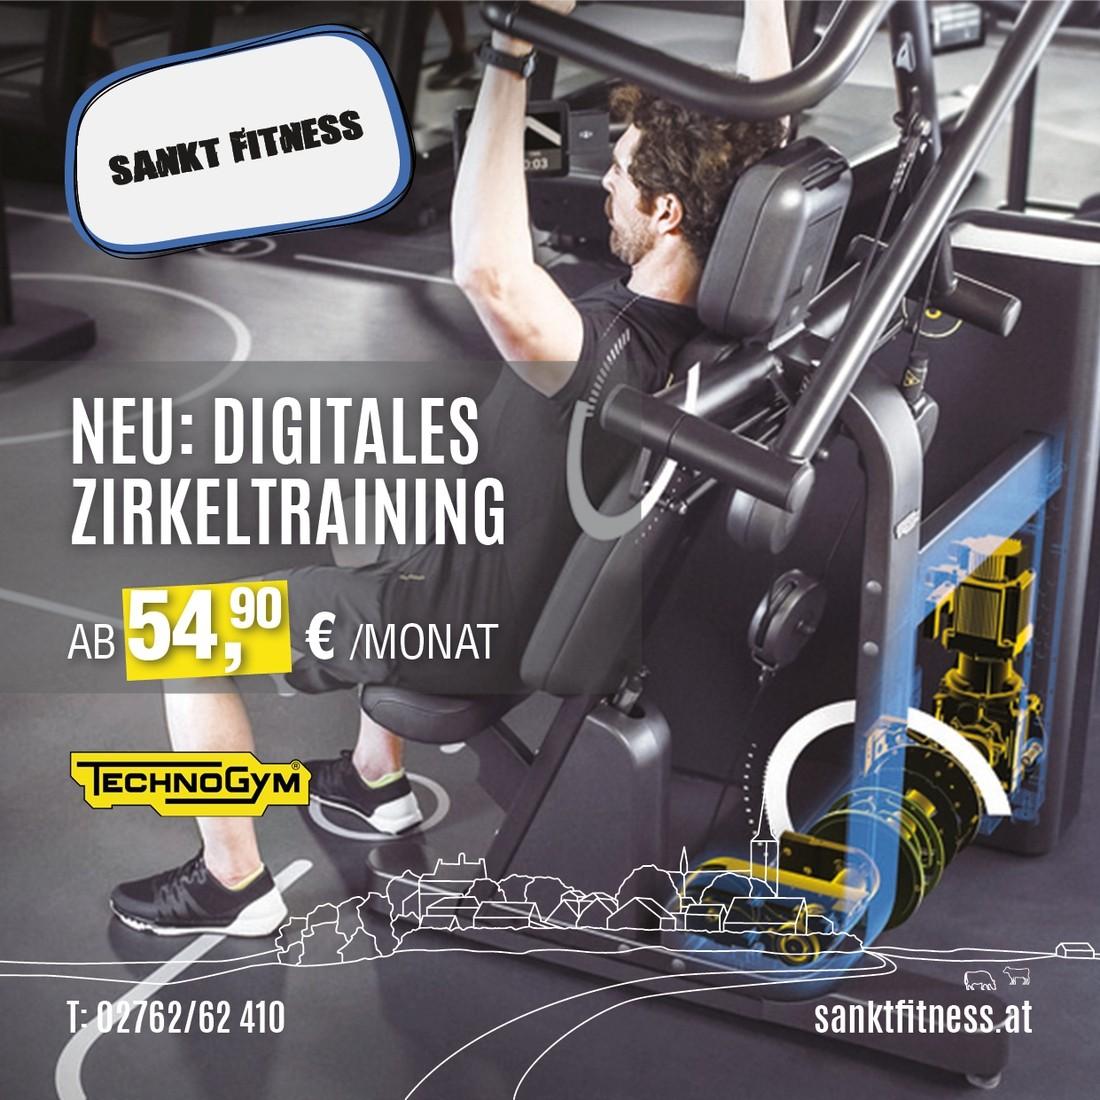 Neu: Digitales Zirkeltraining. Ab 54,90 €/Monat. (TechnoGym)